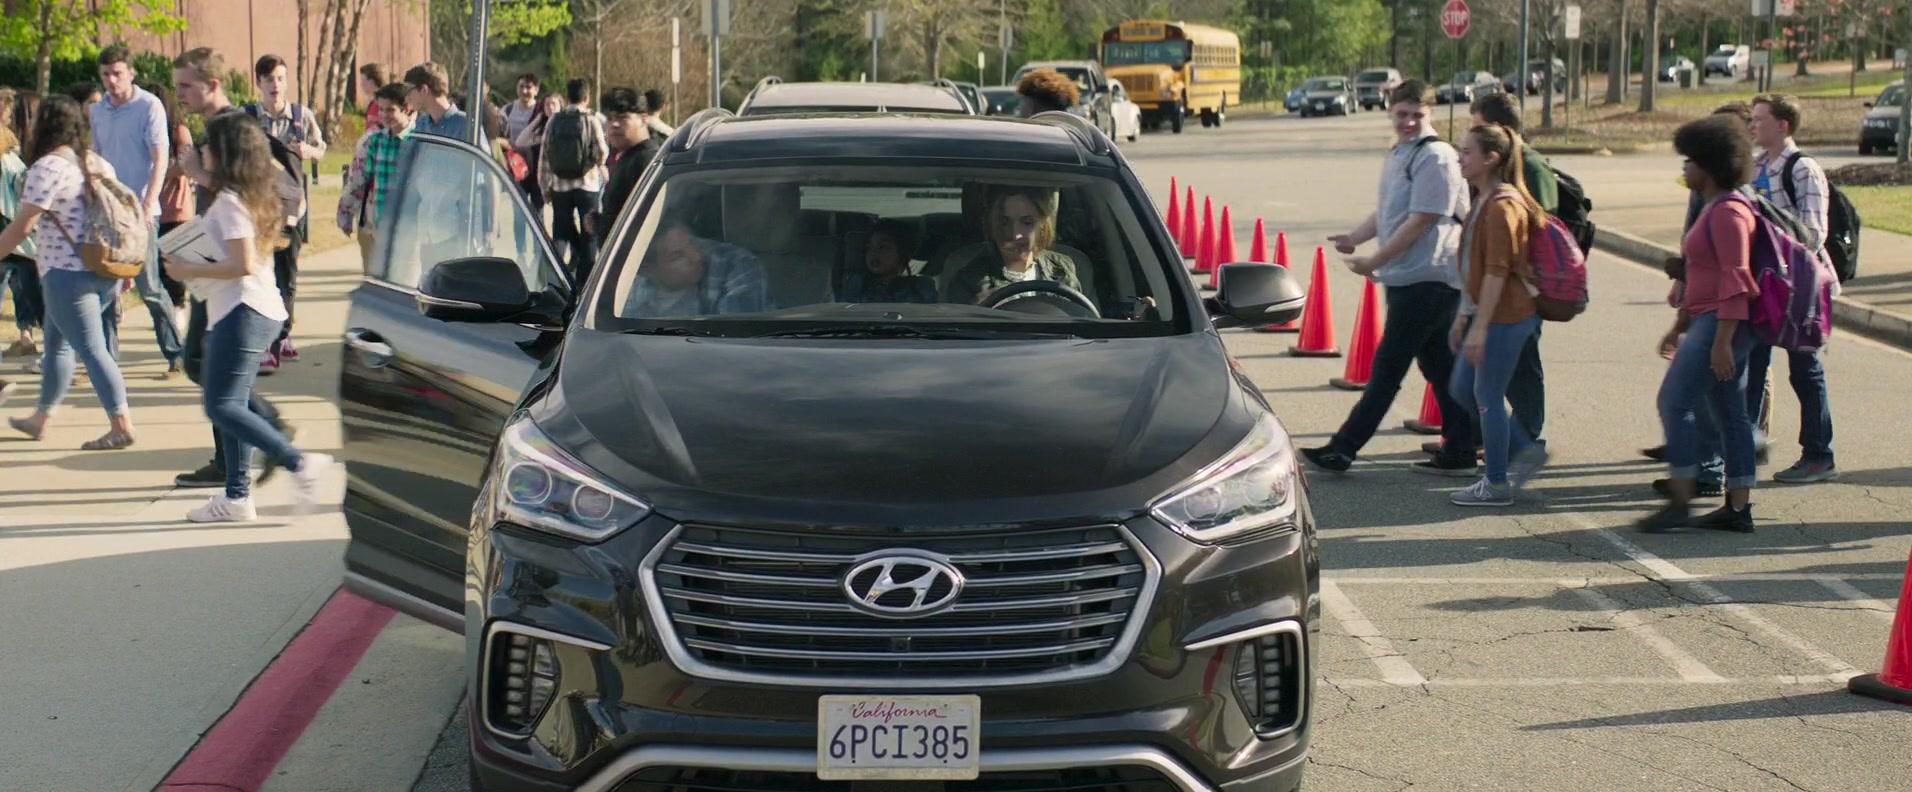 Hyundai Santa Fe Car In Instant Family 2018 Movie